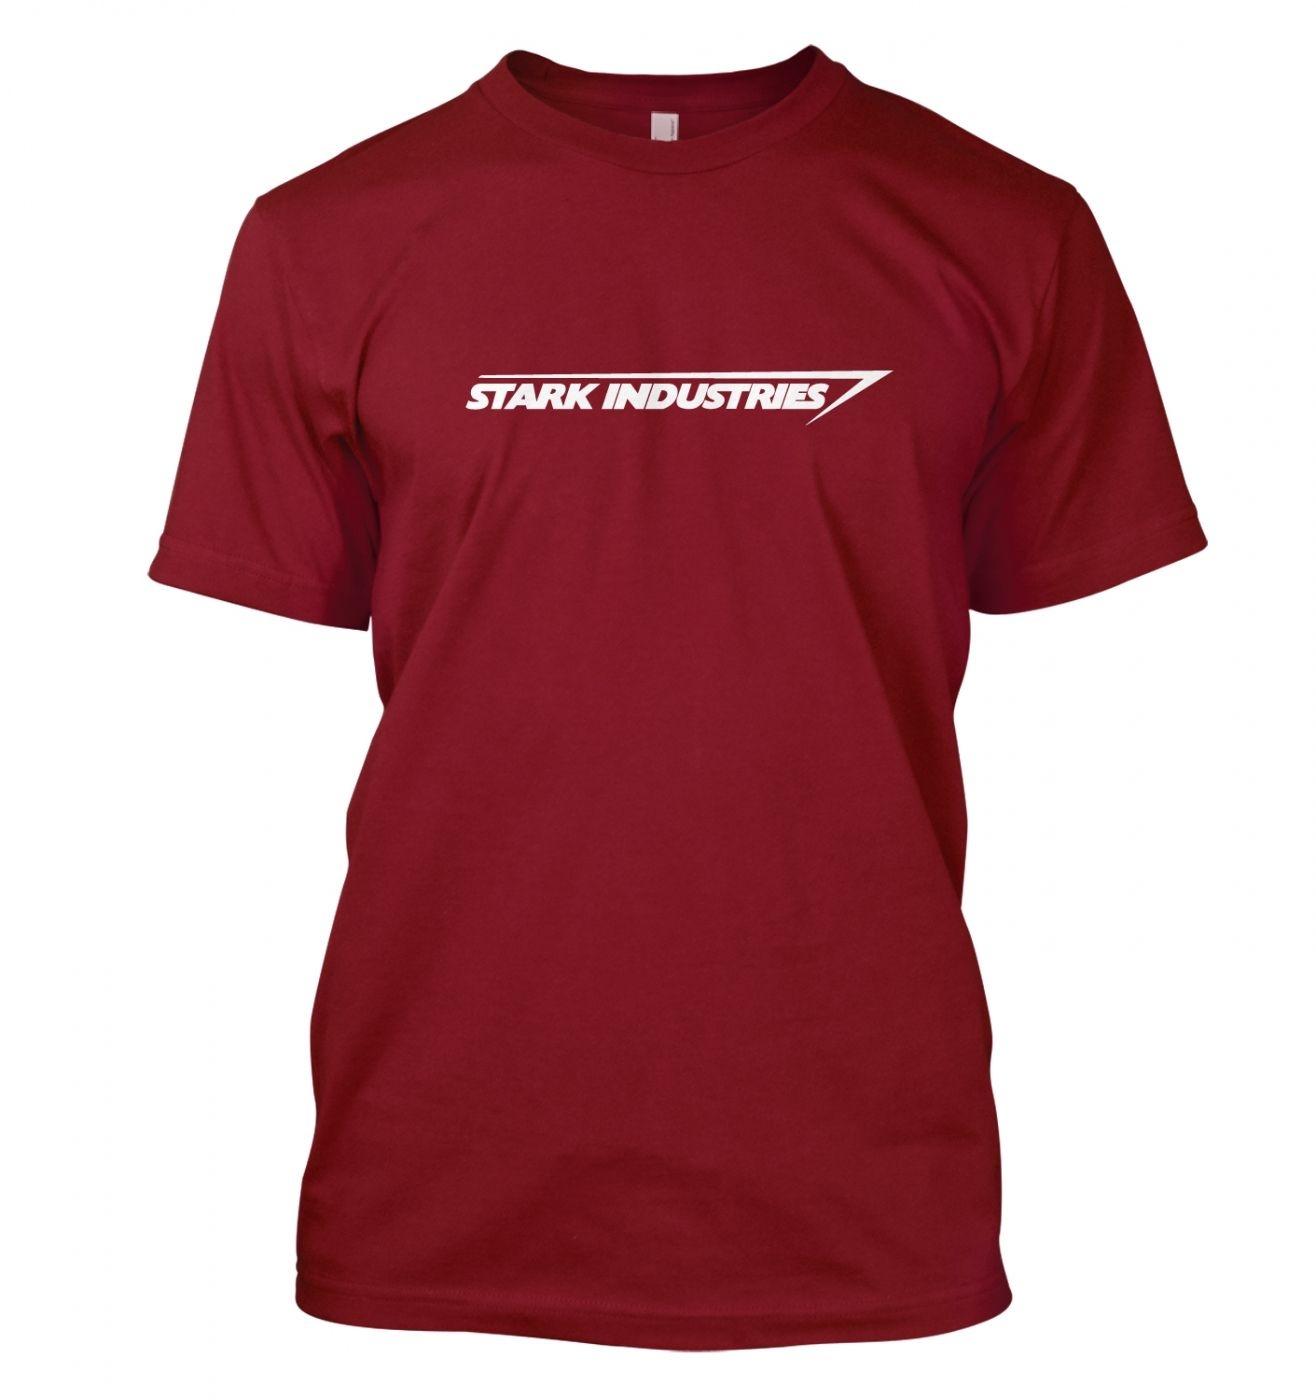 Stark Industries men's t-shirt